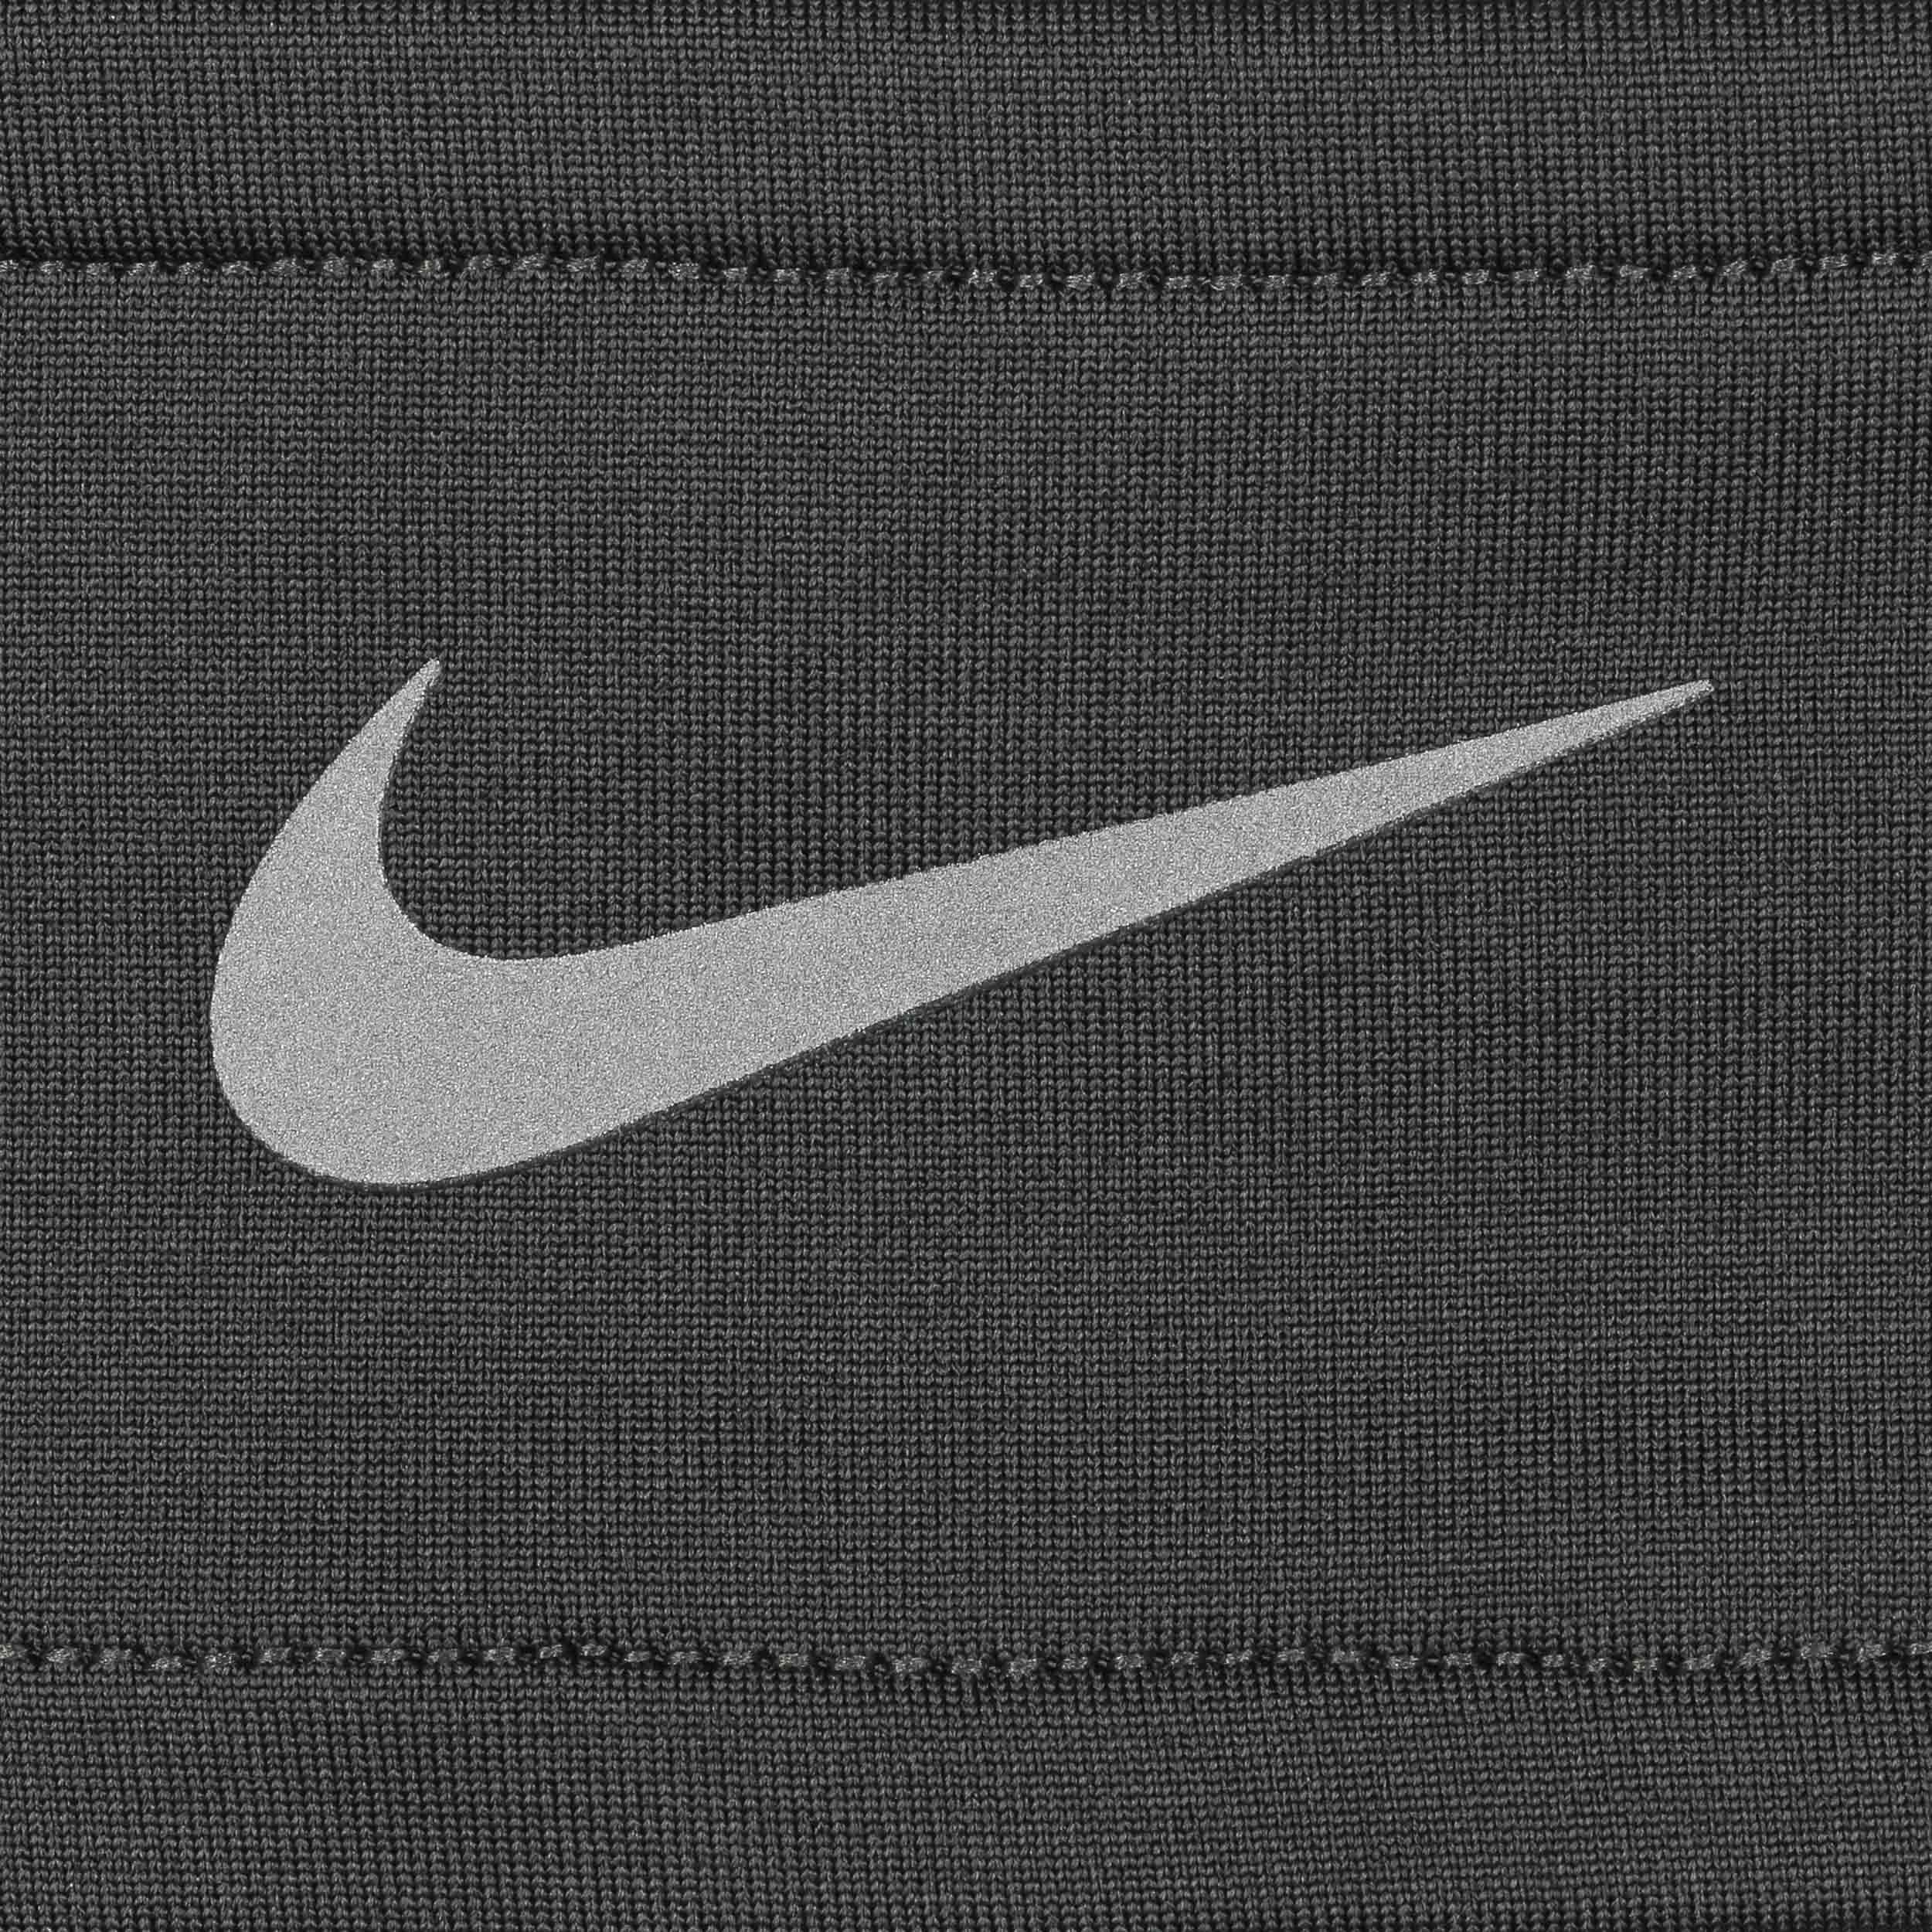 ccca251c1eb3 Set Bandeau + Gants Run Dri-Fit by Nike, EUR 34,95 --  Chapeaux ...